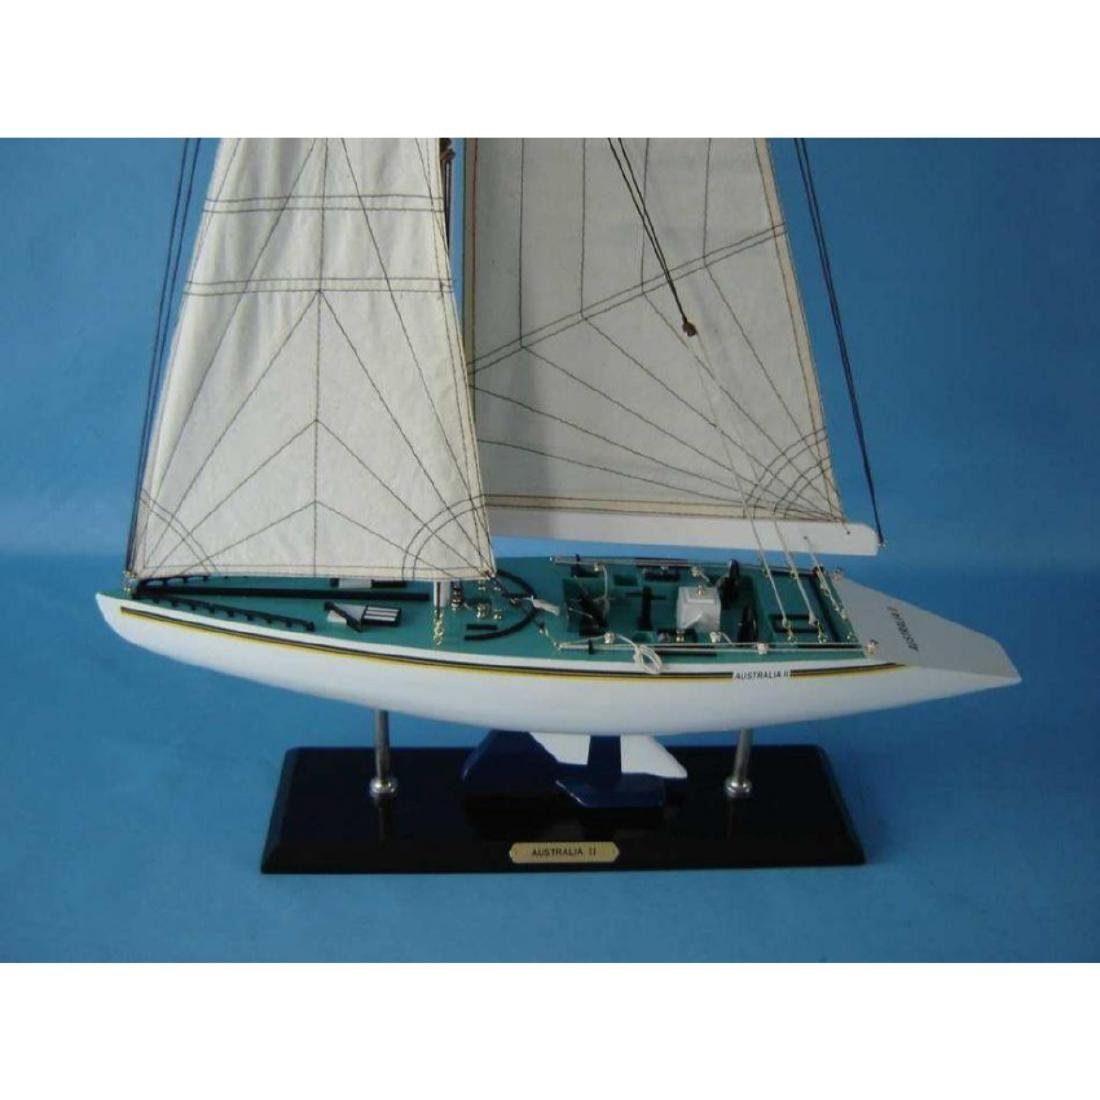 "Wooden Australia 2 Limited Model Yacht 40"" - 5"